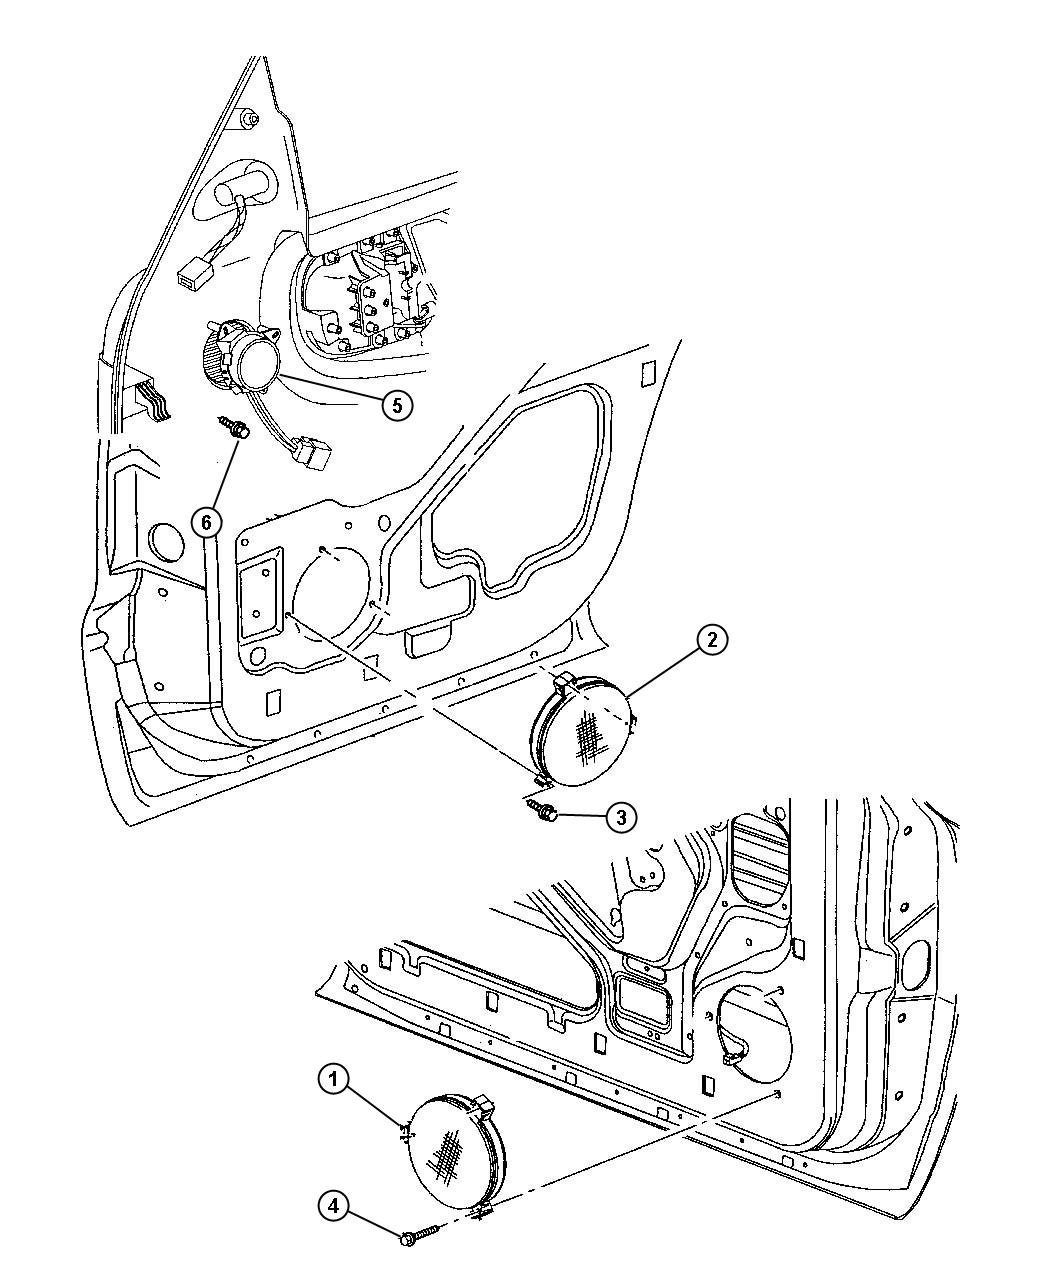 Dodge Durango Screw. Round head. 164-15x1.00. Trim: [all